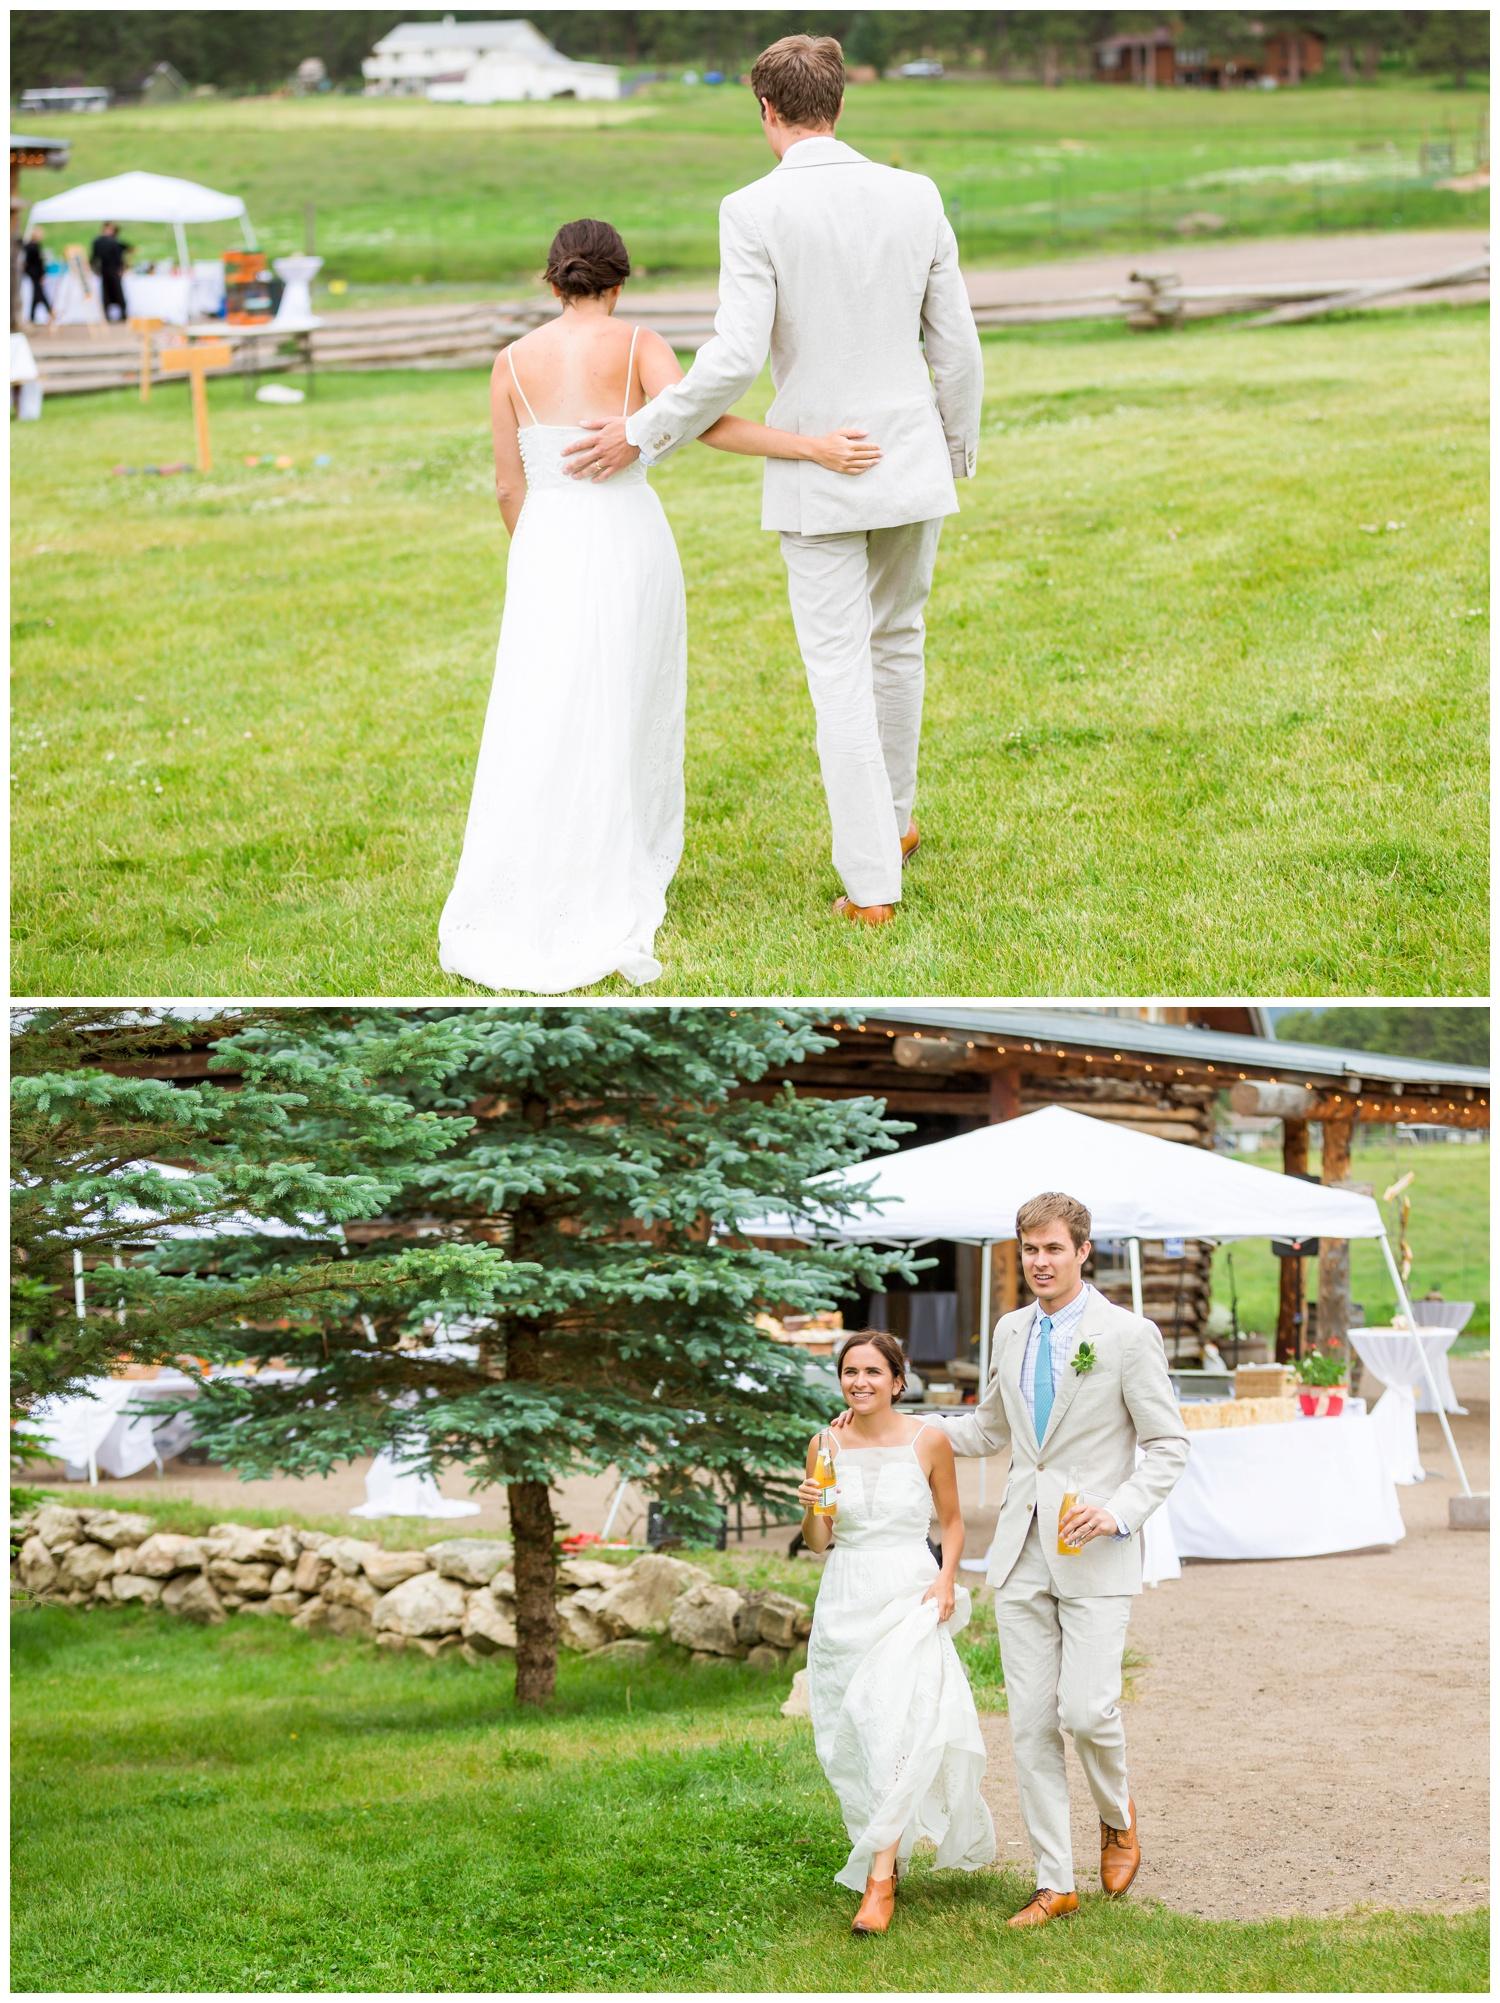 evergreen wedding photography018.jpg